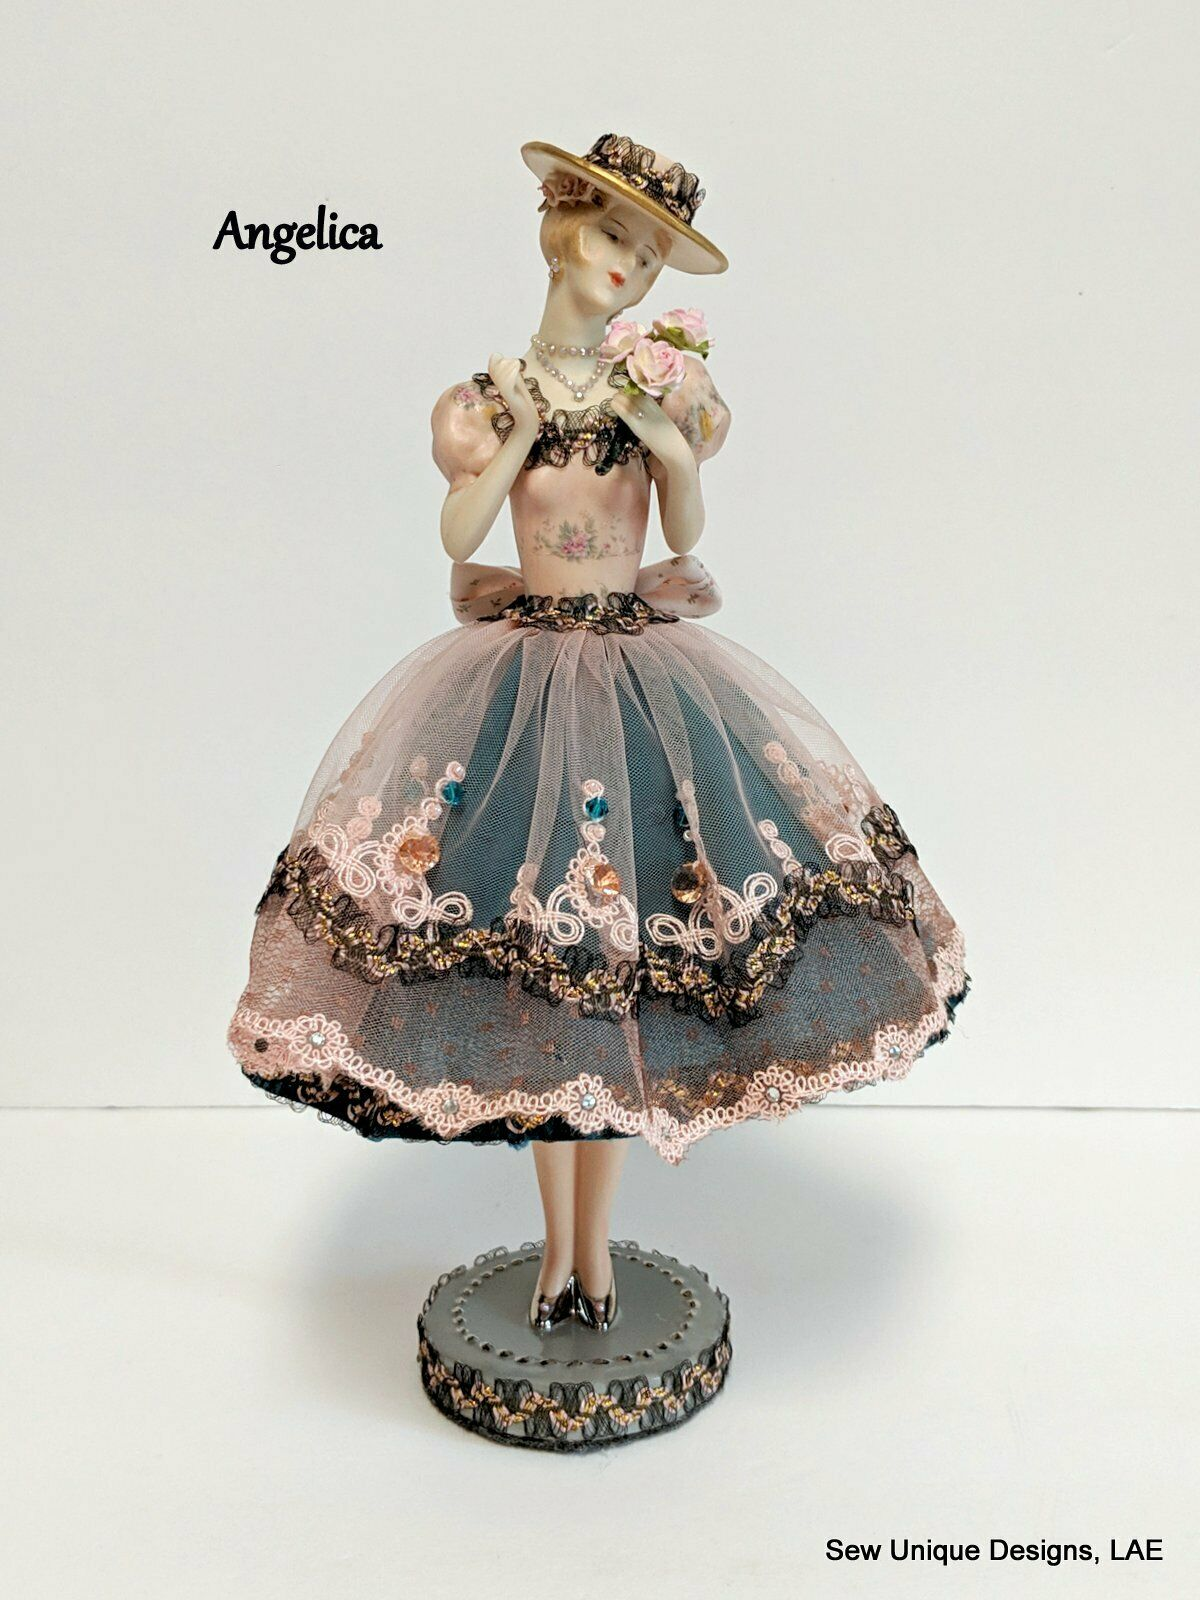 Half bambola  w LEGS, Boudoir bambola, Porcelain moda Art bambola, Collectible OOAK  grandi prezzi scontati